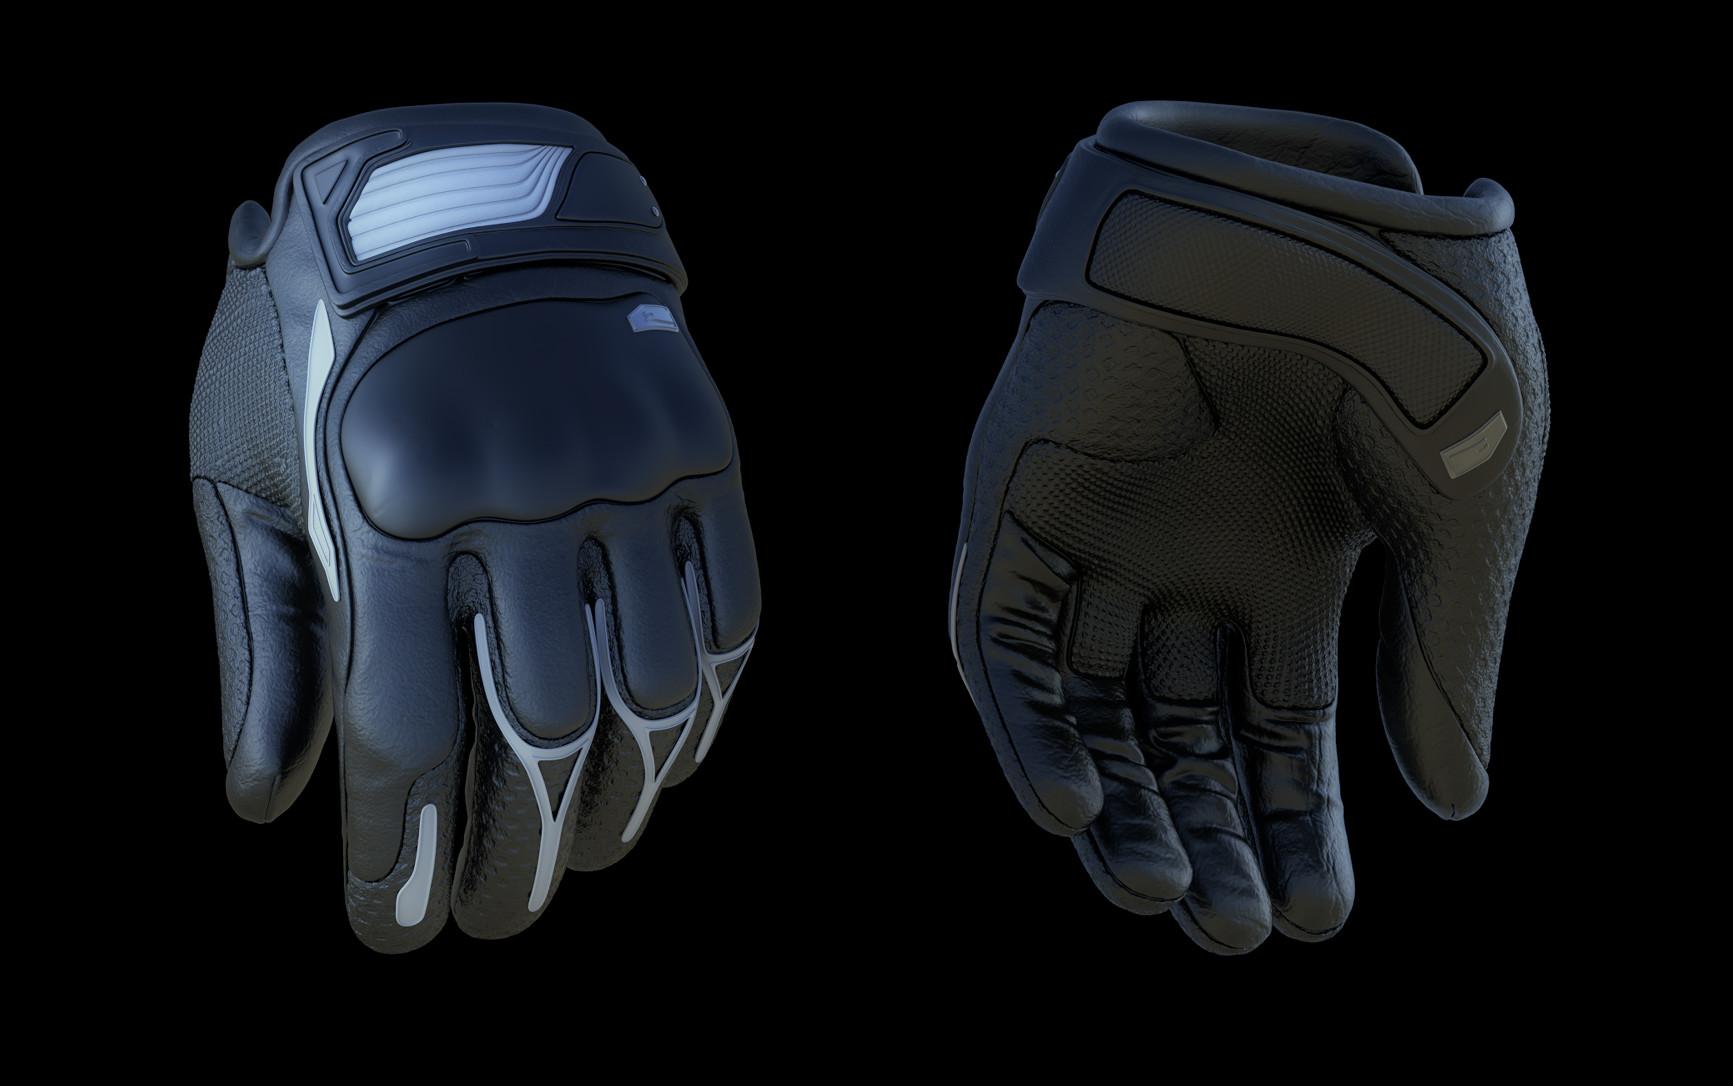 Ryan reid glove